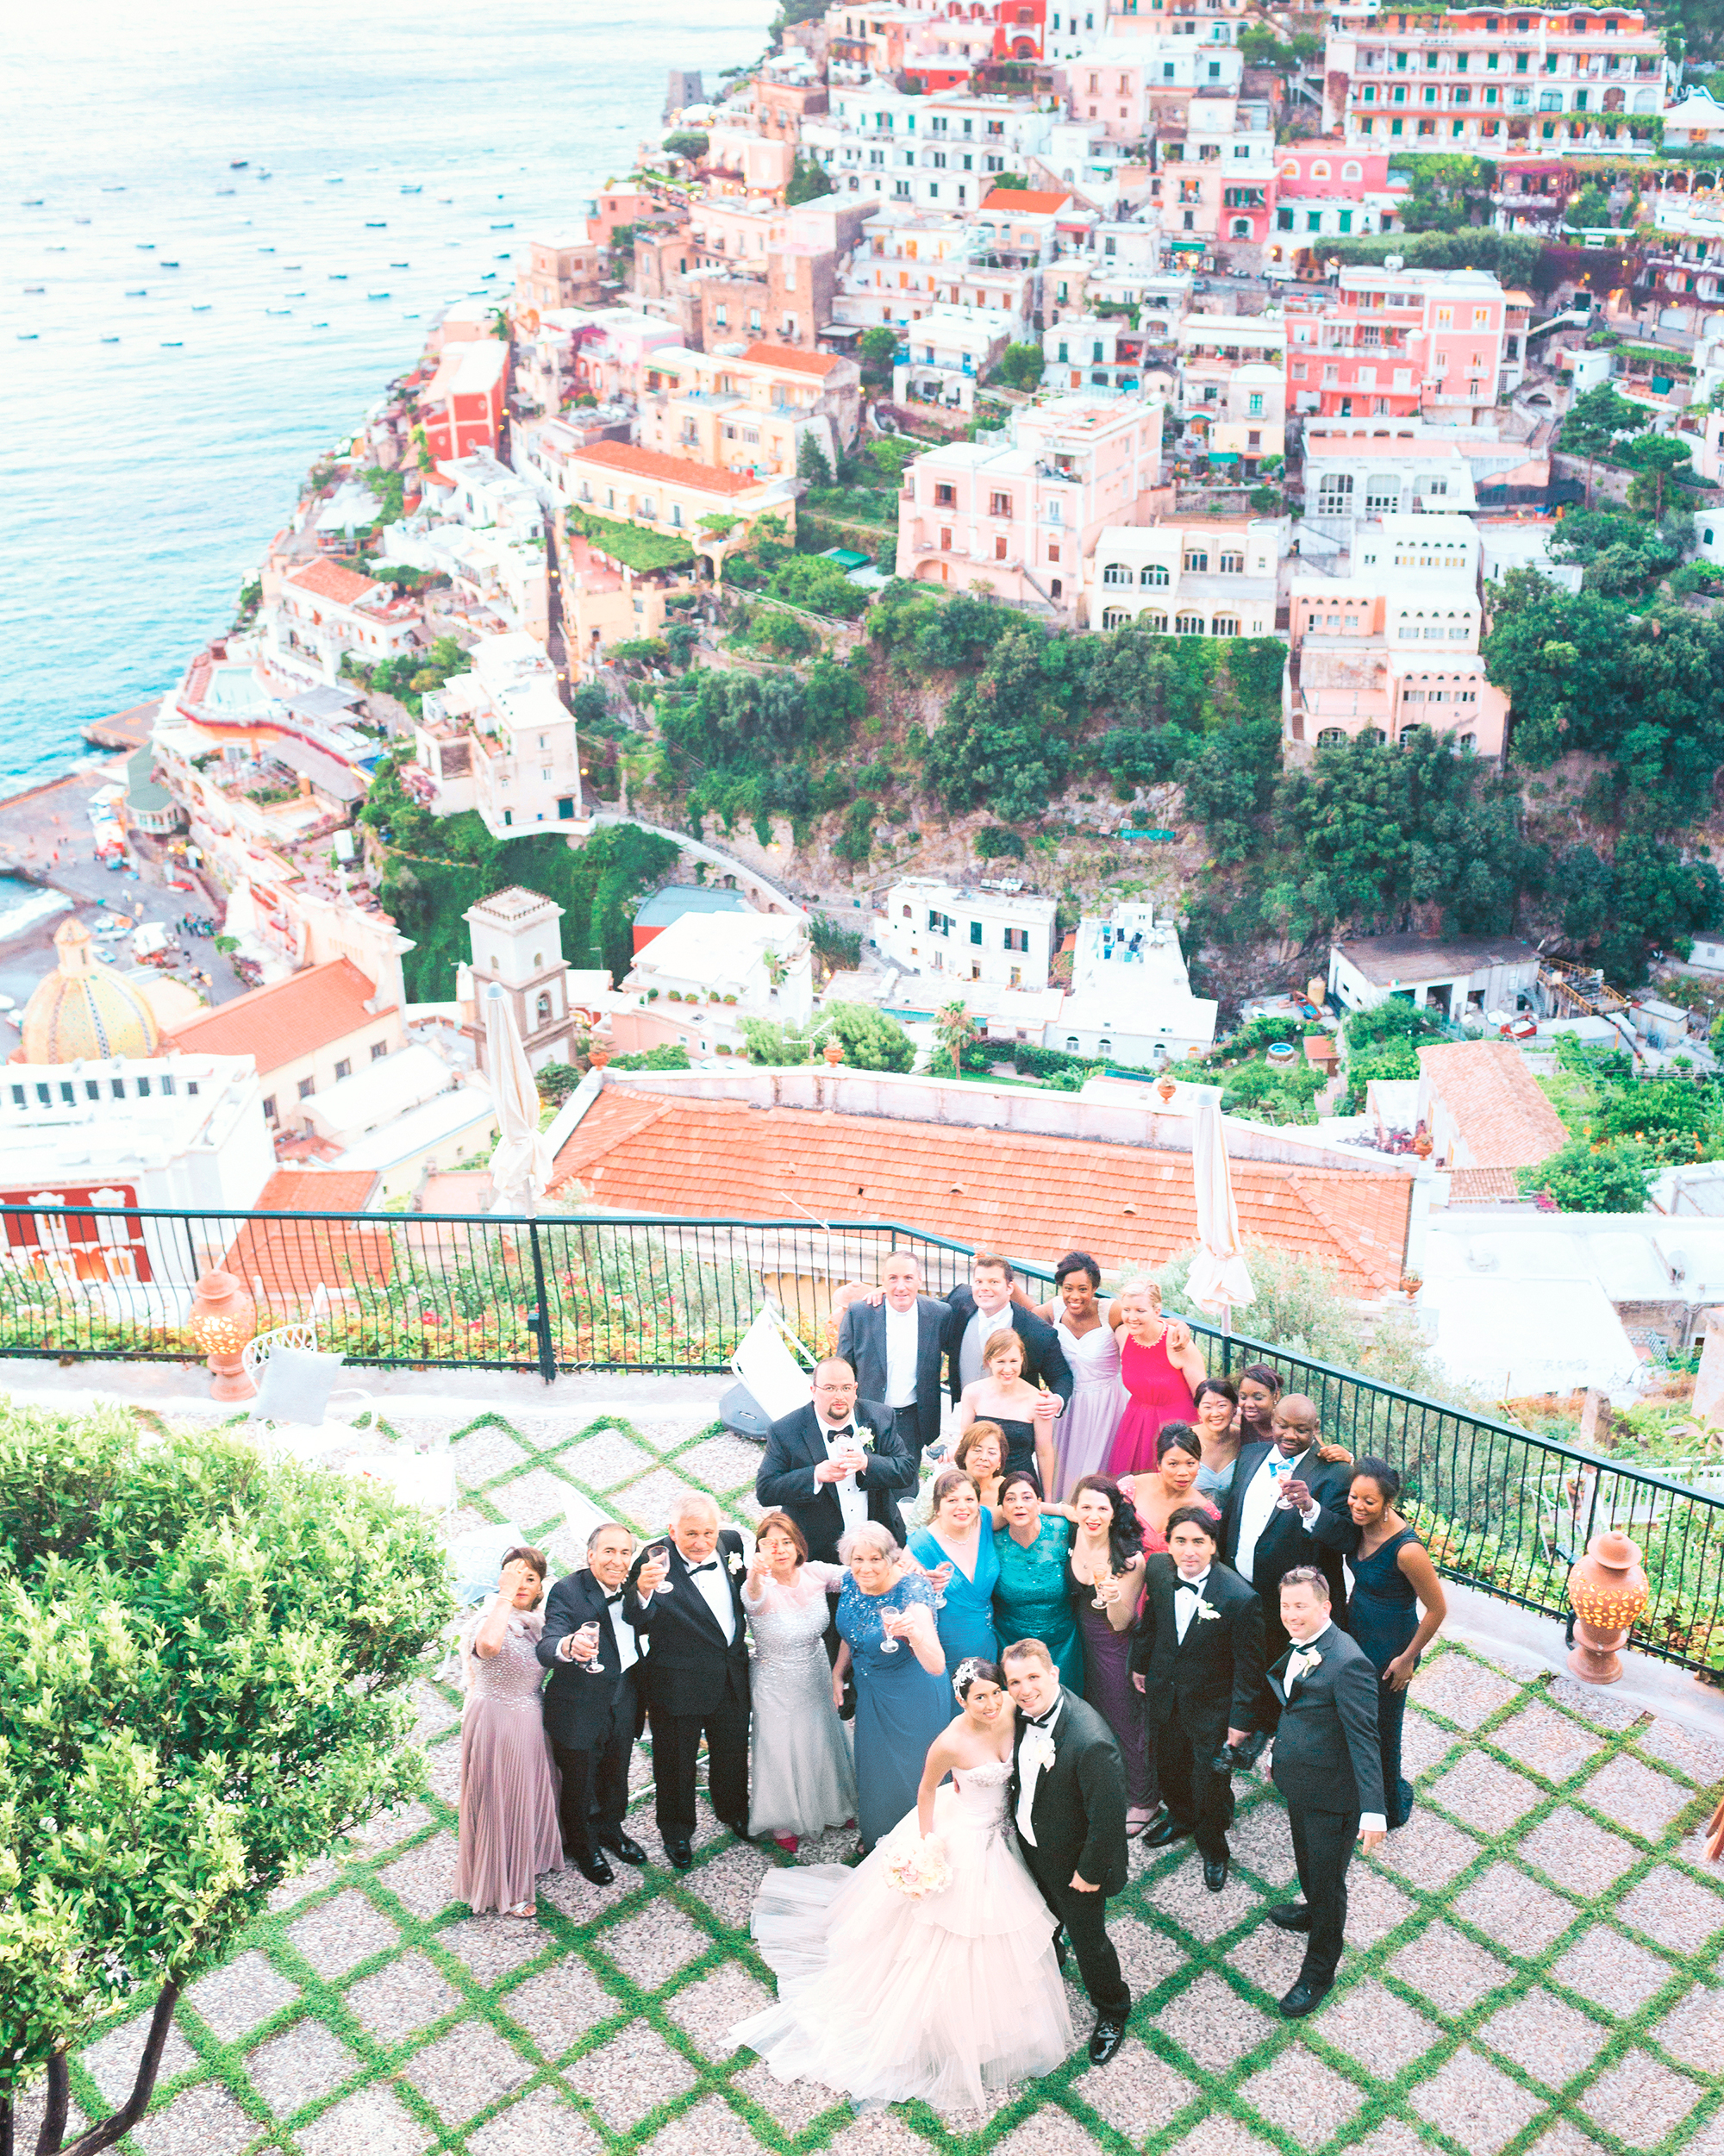 michelle-christopher-positano-bride-groom-wedding-party-1072-s111681.jpg